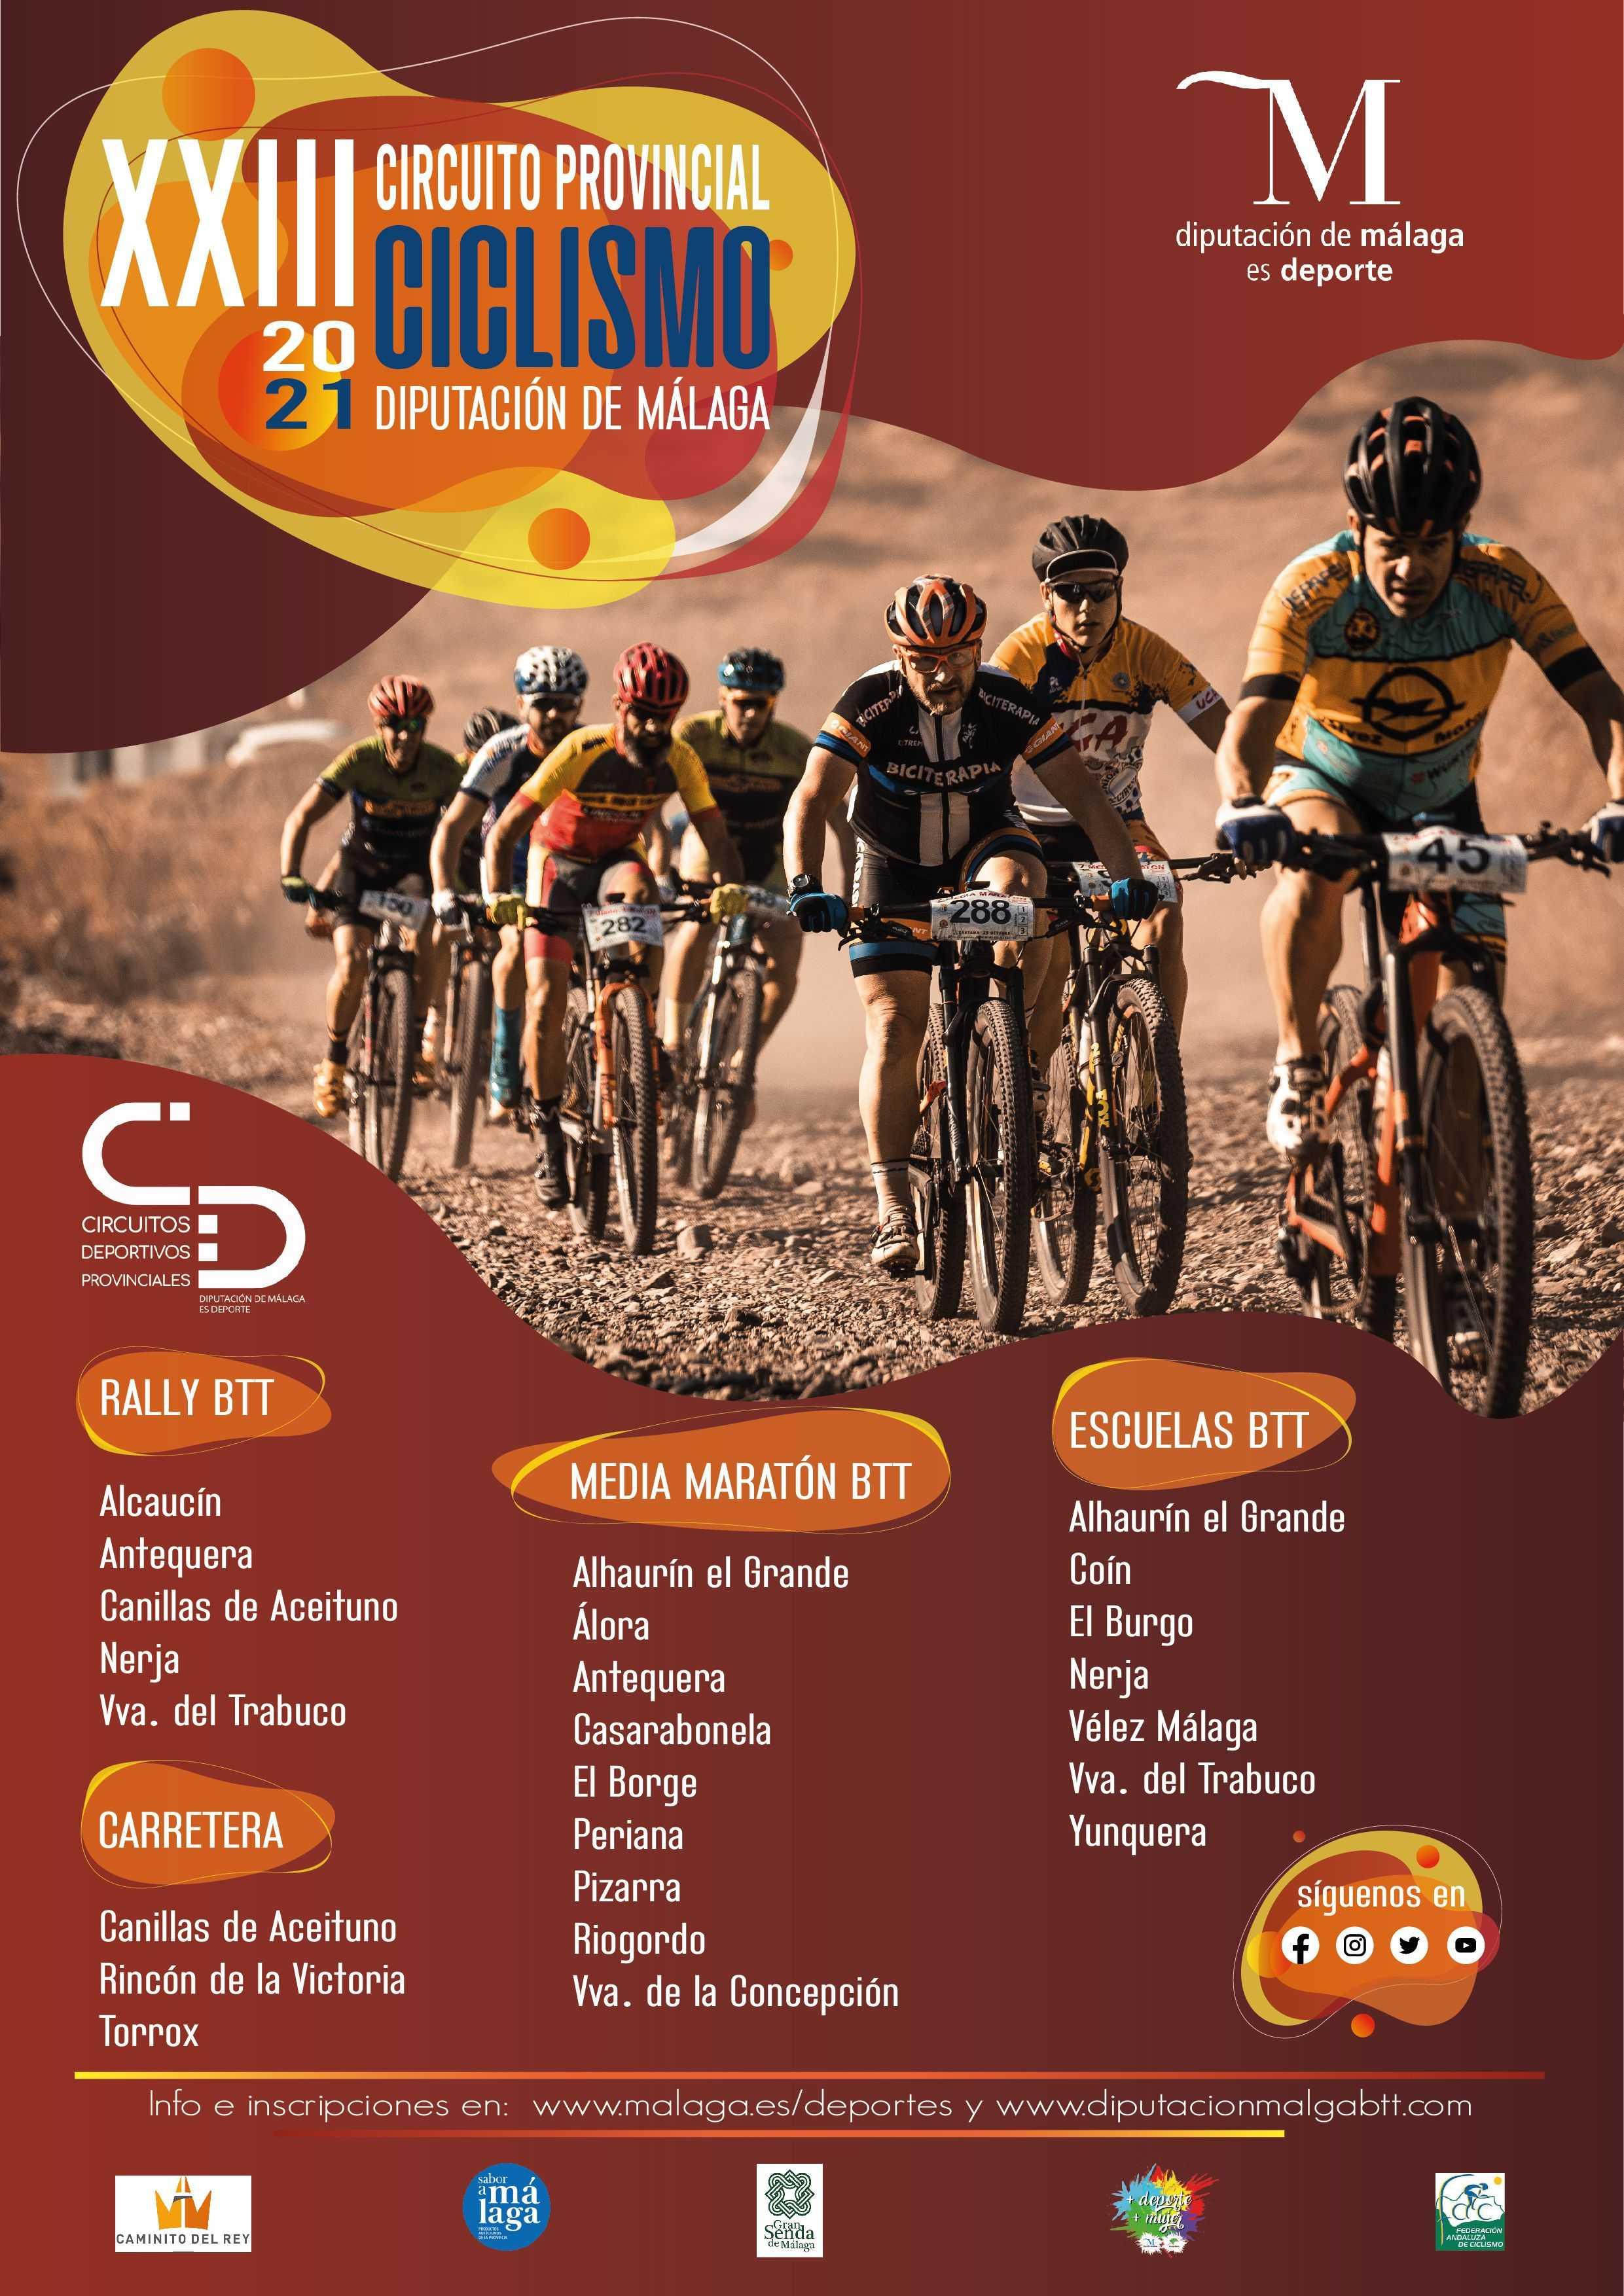 Fechas del XXIII Circuito Provincial de Ciclismo Diputación de Málaga